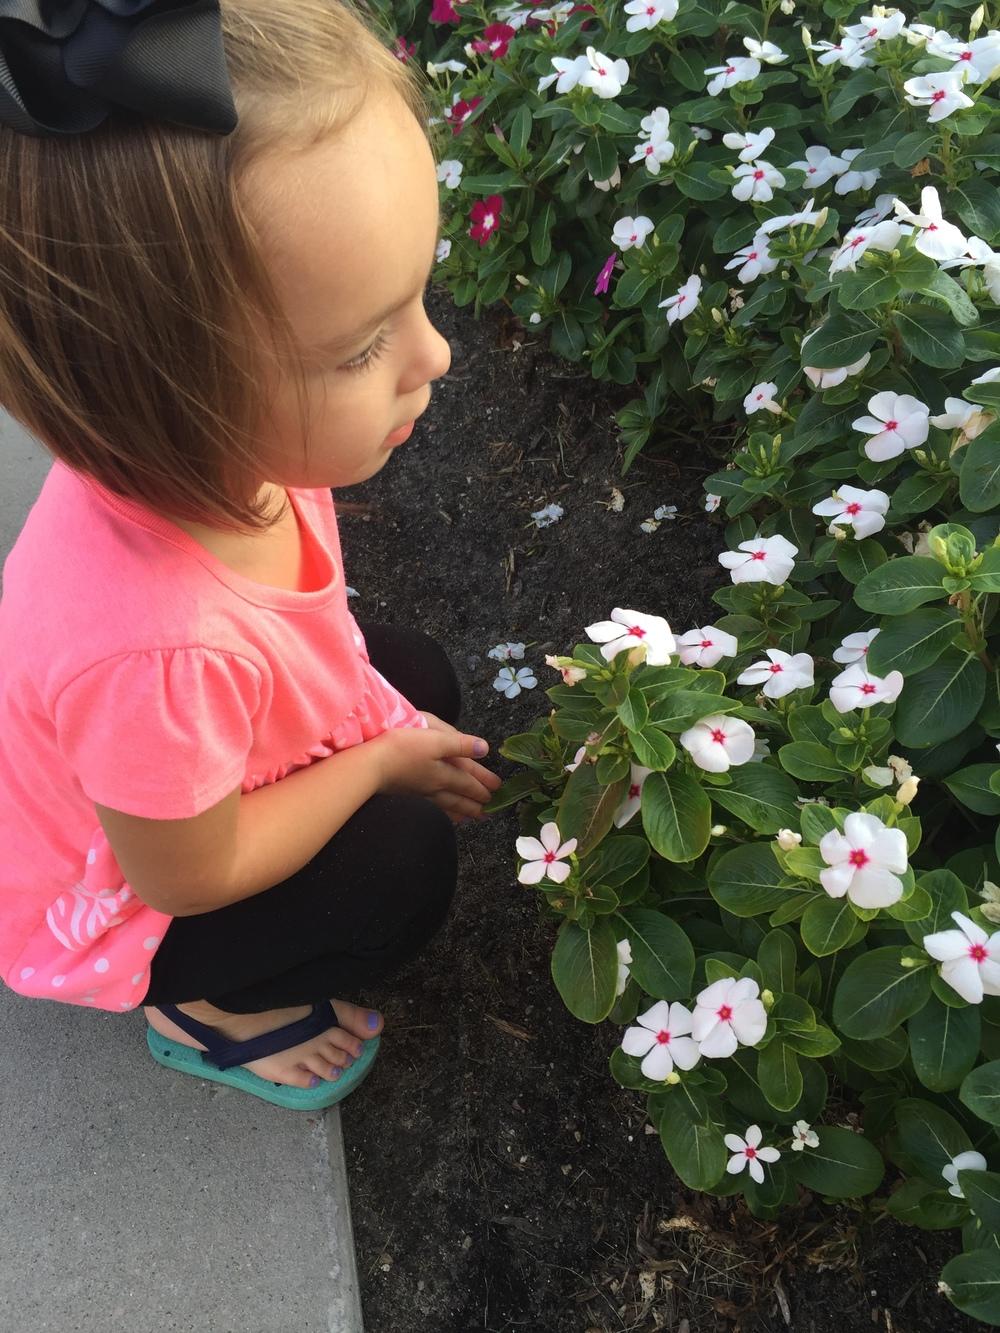 My littlest enjoying the flowers at the Market